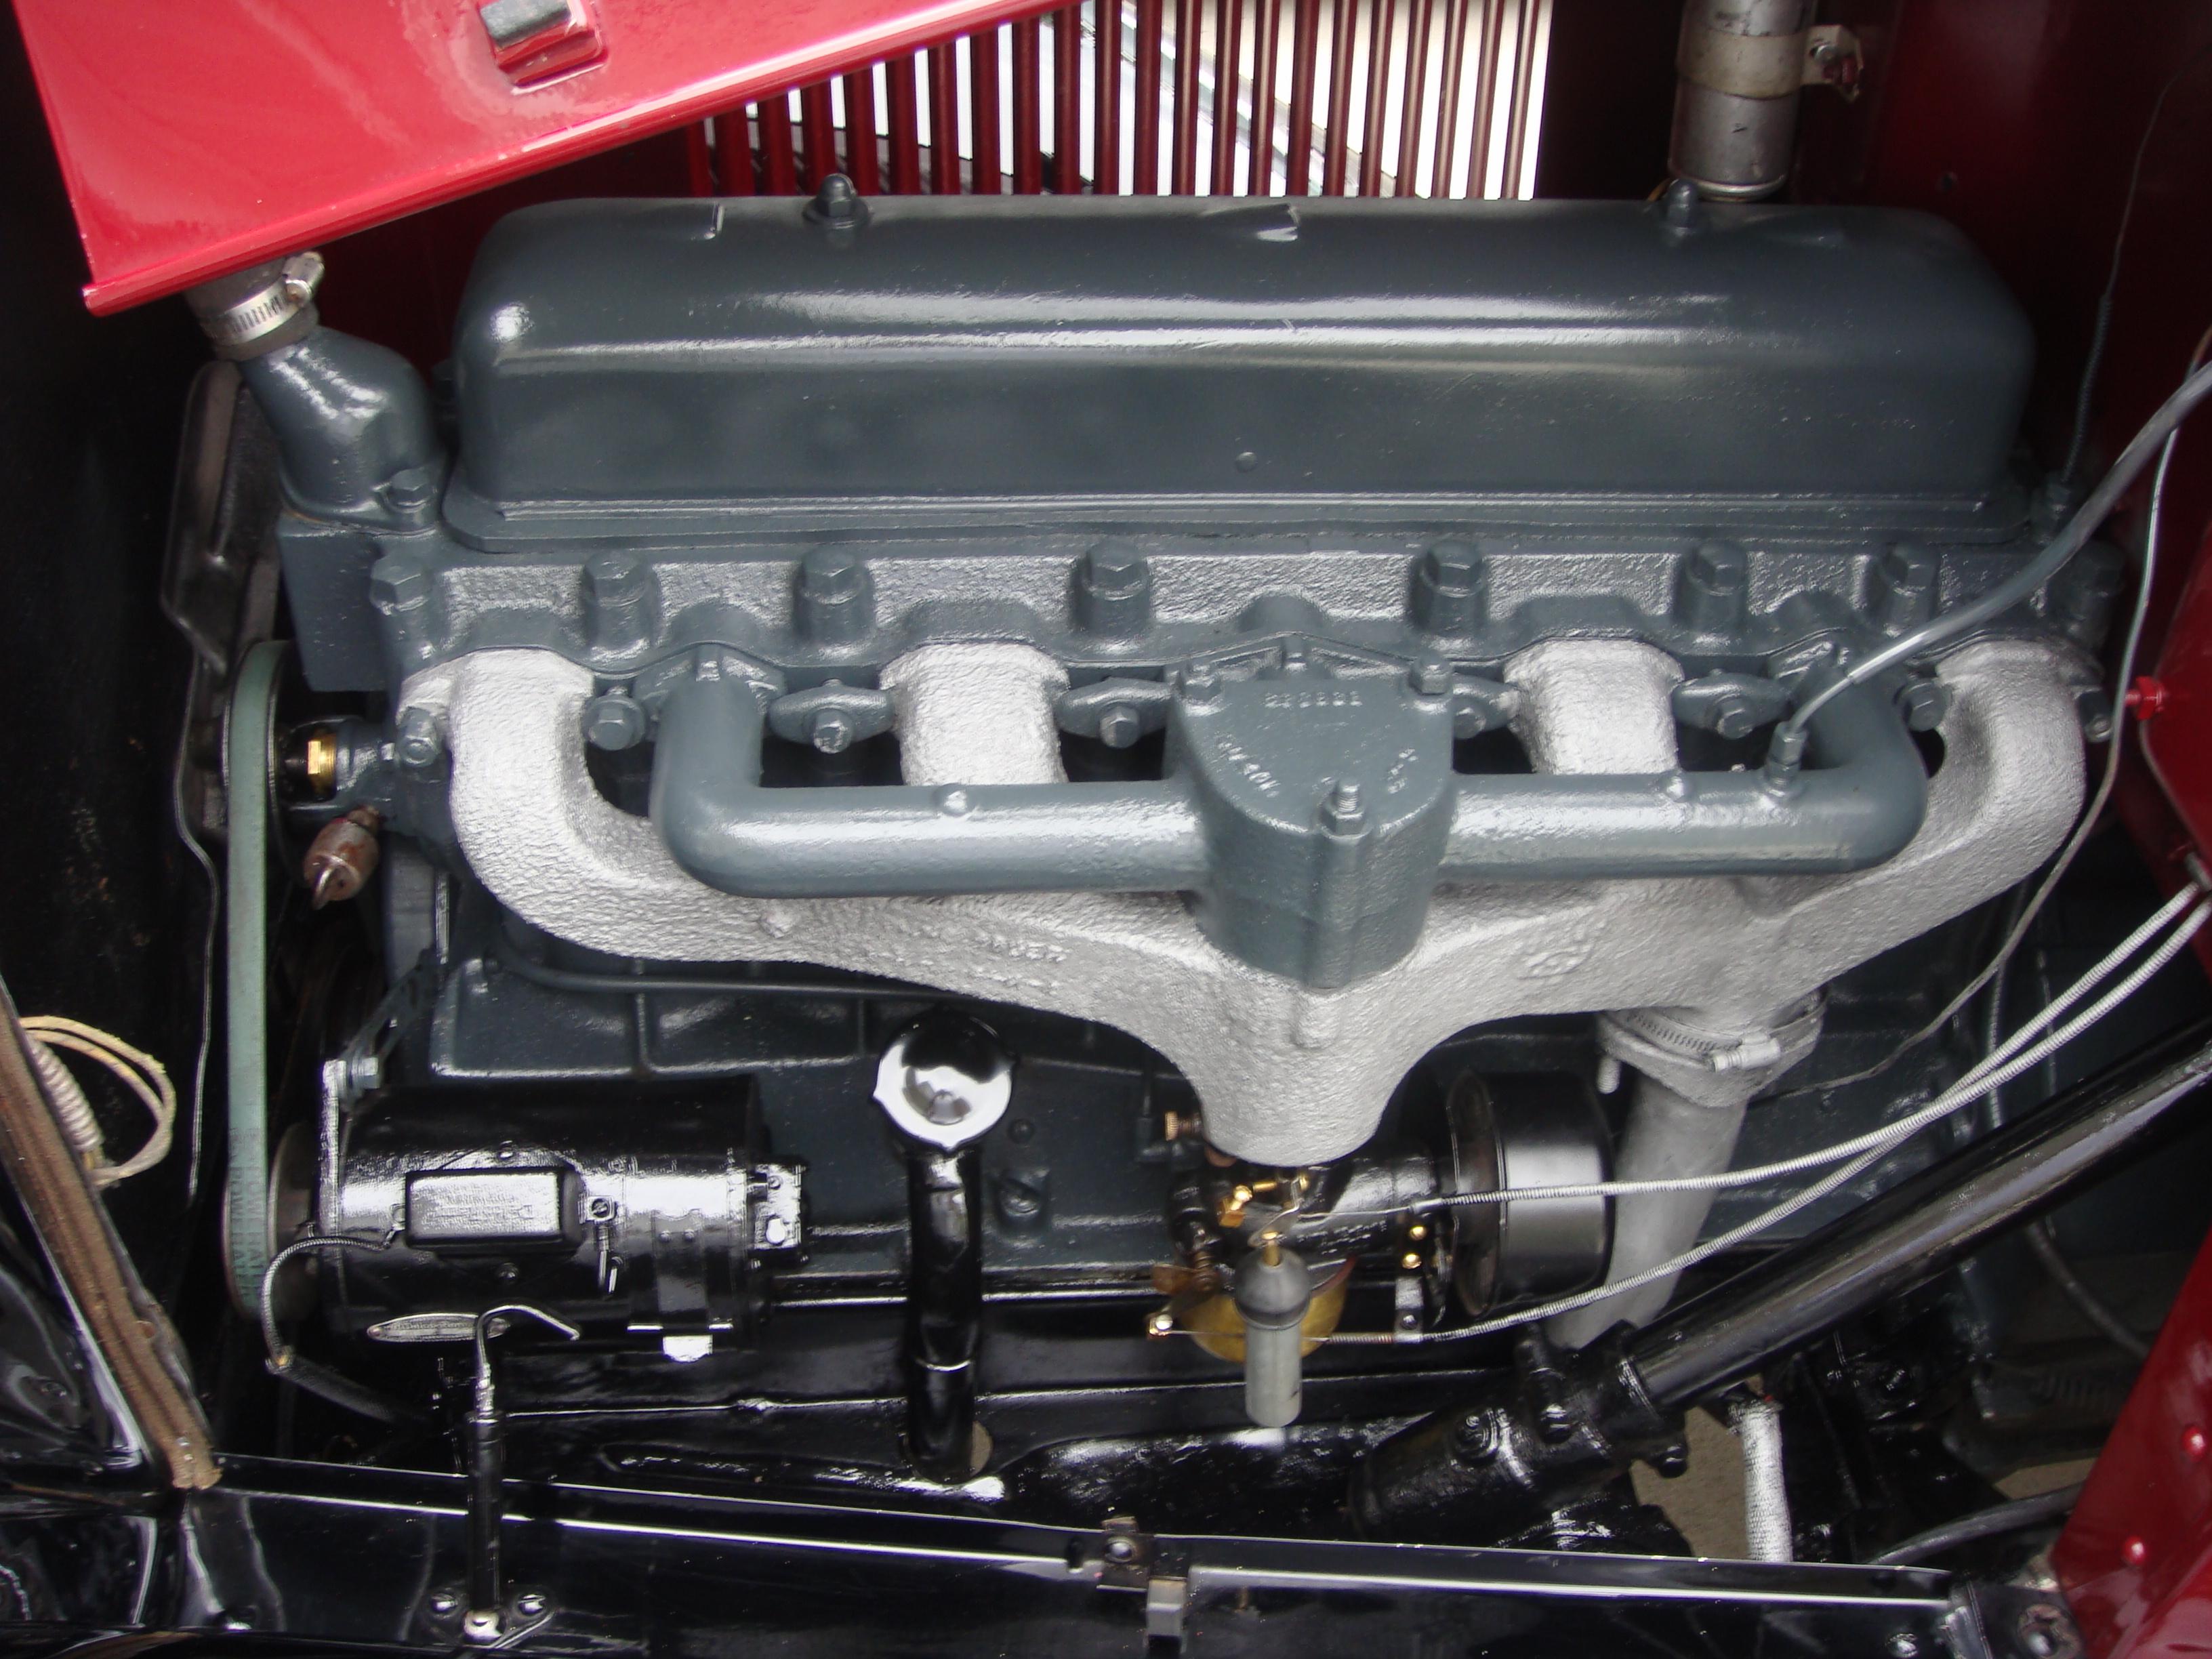 Dsc on Chevy 235 Inline 6 Cylinder Distributor